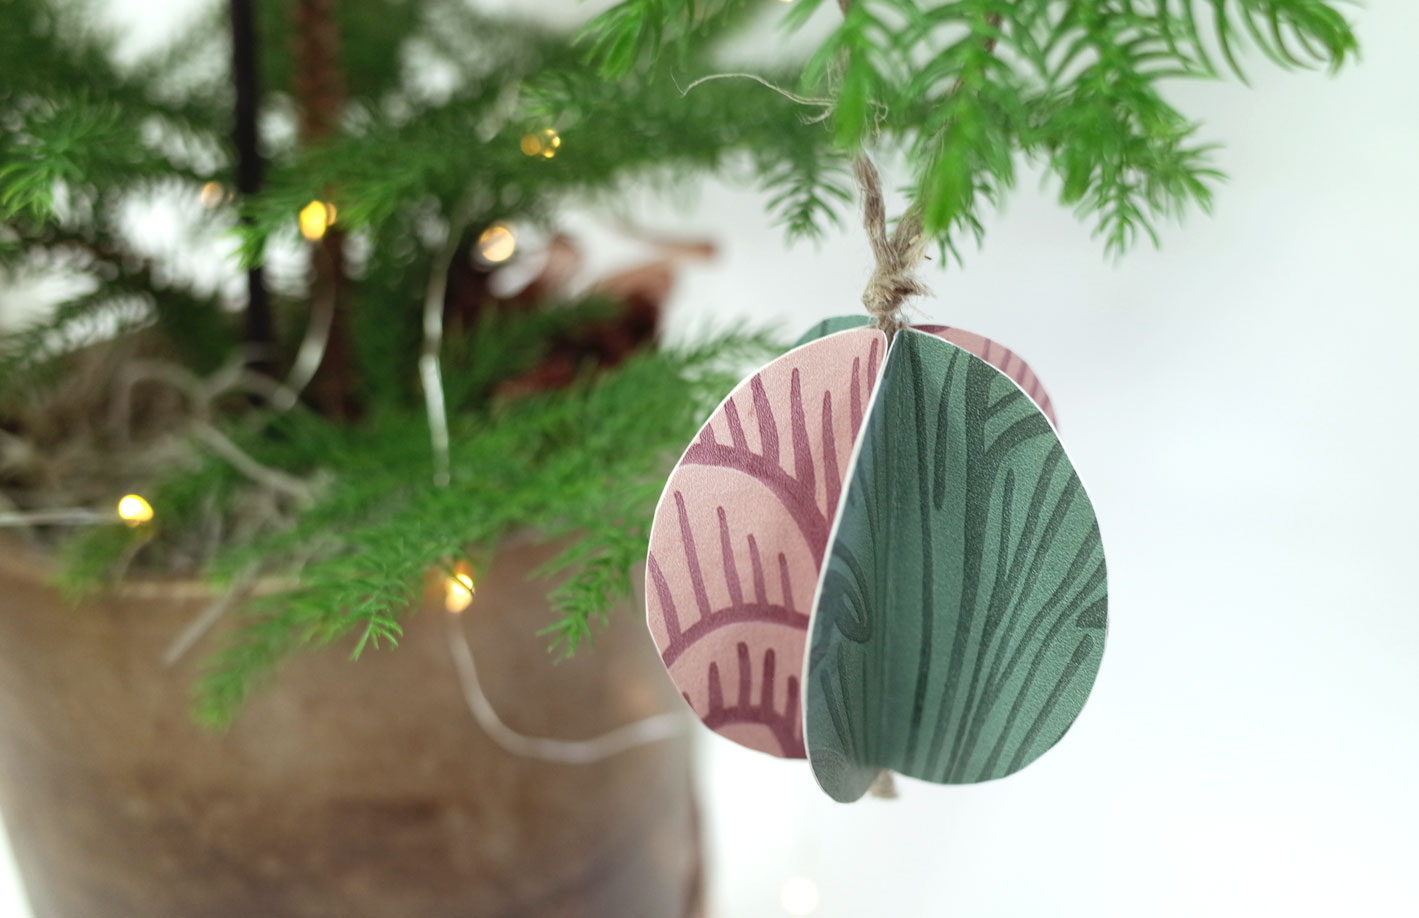 julpyssel-papperskulor-i-granen-rosa-grönt-midbec-tapeter